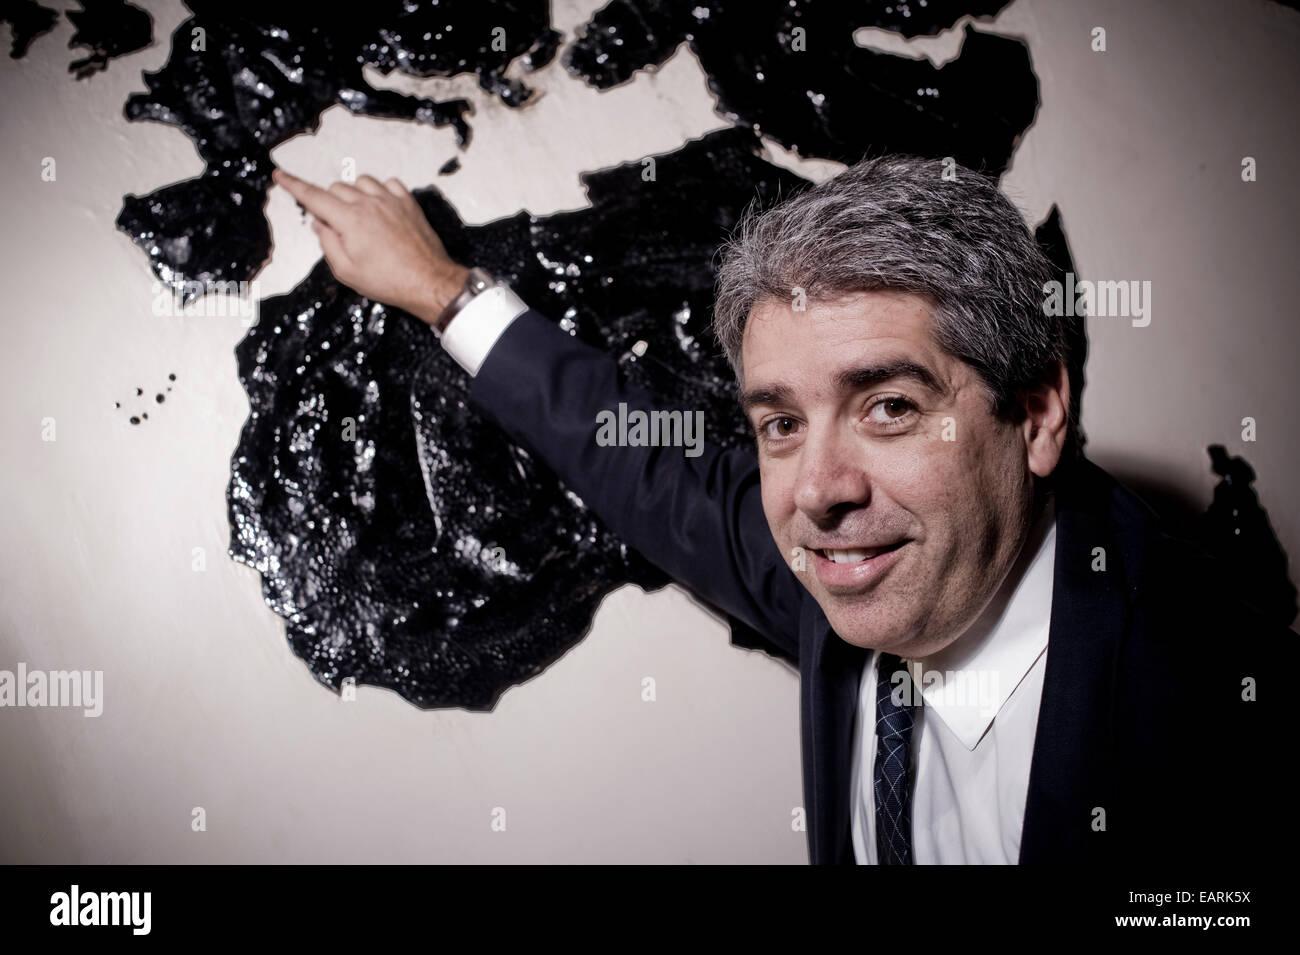 Francesc Homs i Molist, Catalan politician. Madrid, Spain. - Stock Image